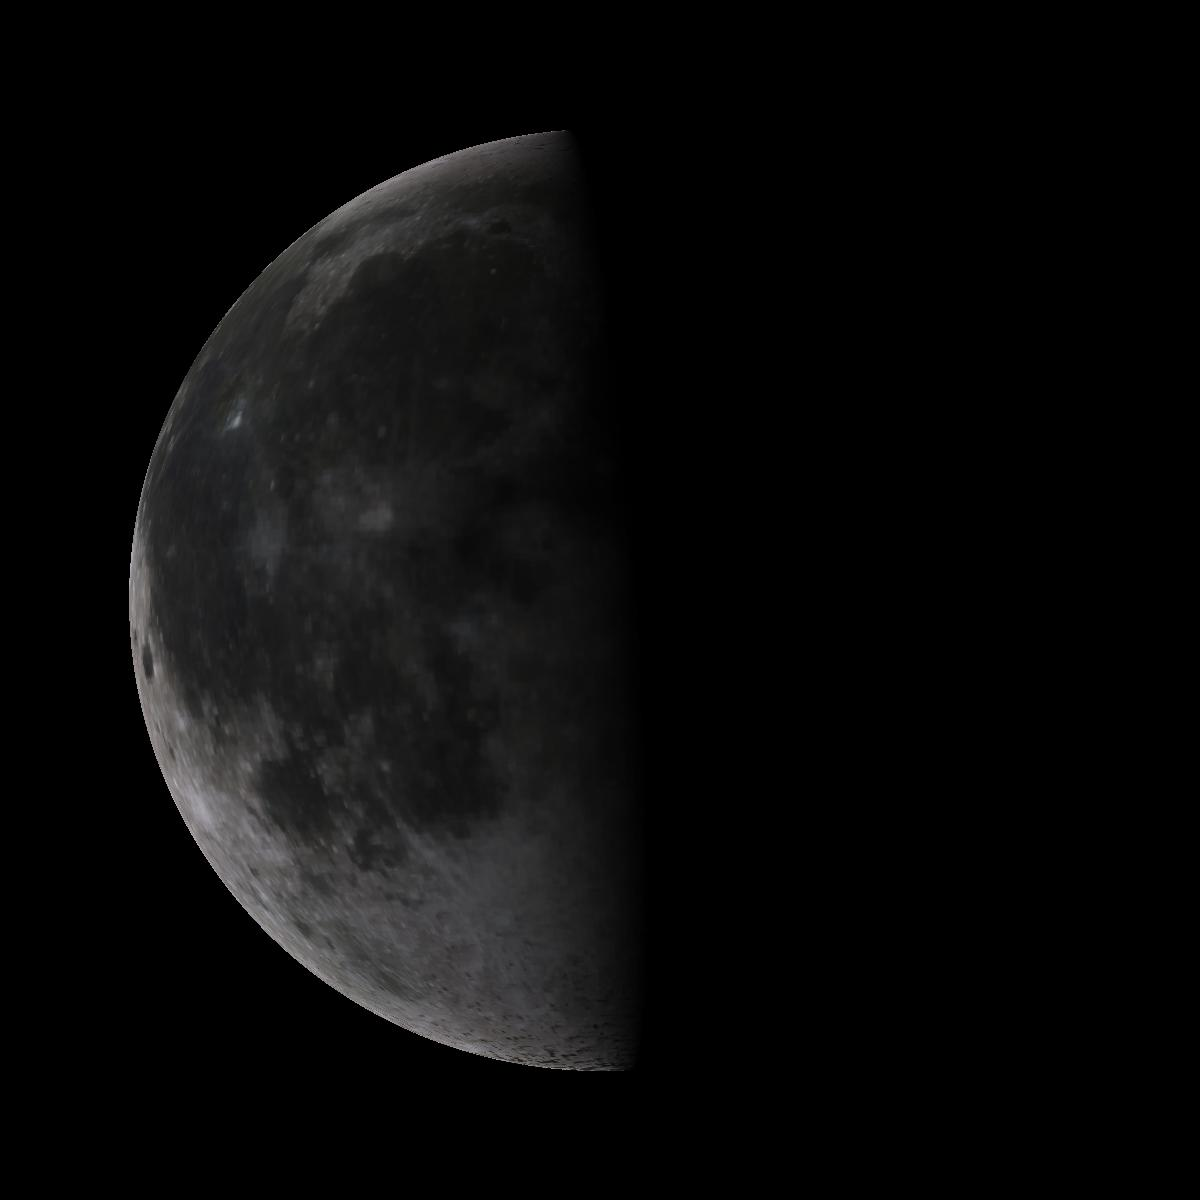 Lune du 16 mars 2020